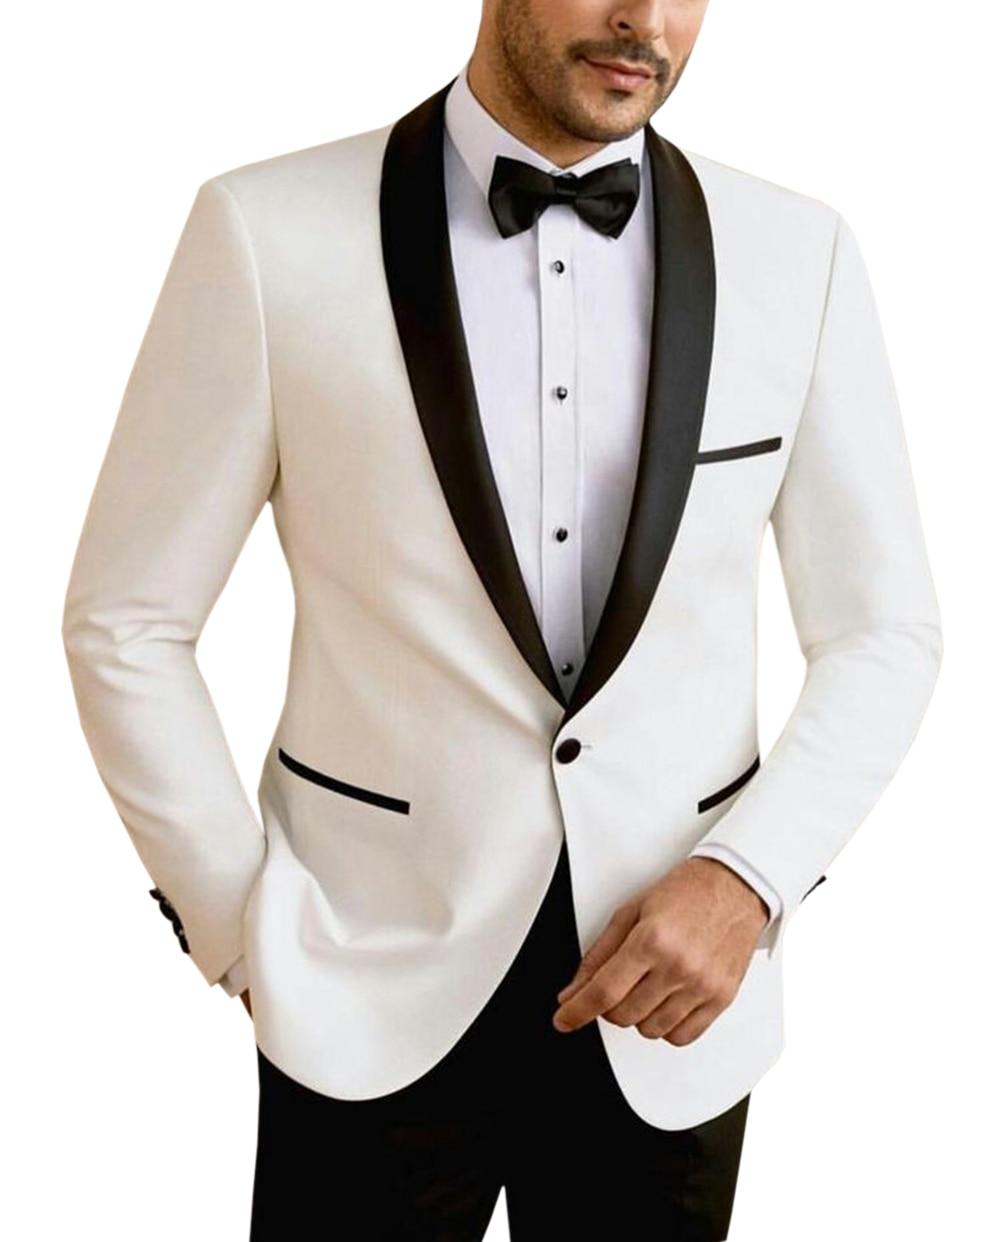 Solovedress Mens Suit Premium Prom Wedding Tuxedos 2 Piece Blazer & Trousers Modern Slim Fit Jacket Vest Trousers Dinner Wedding